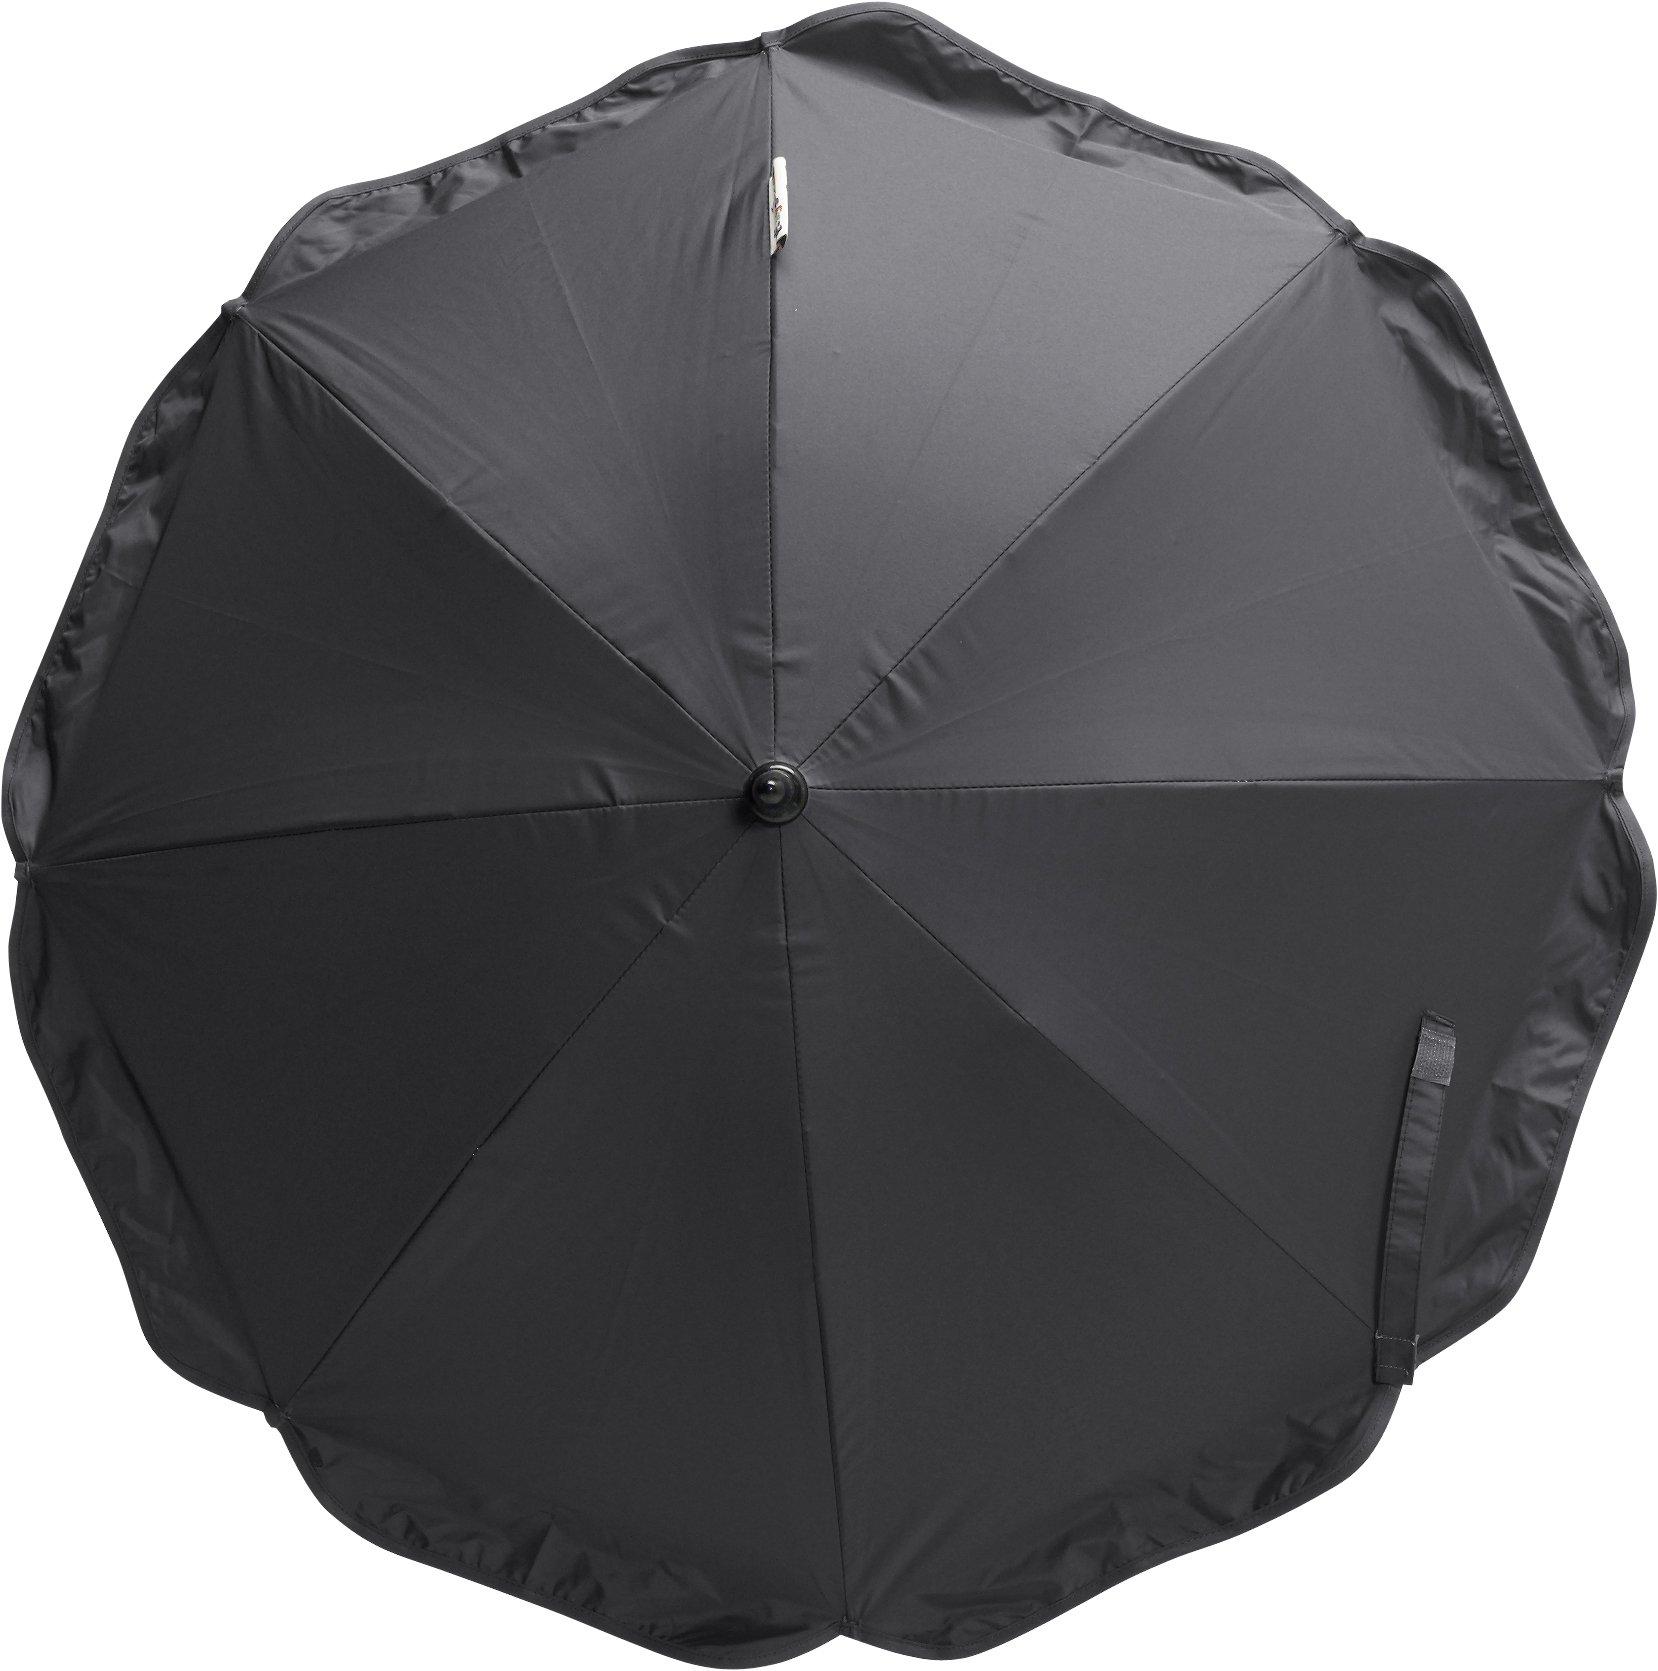 Playshoes Universal Stroller Parasole Sun Umbrella (Black)